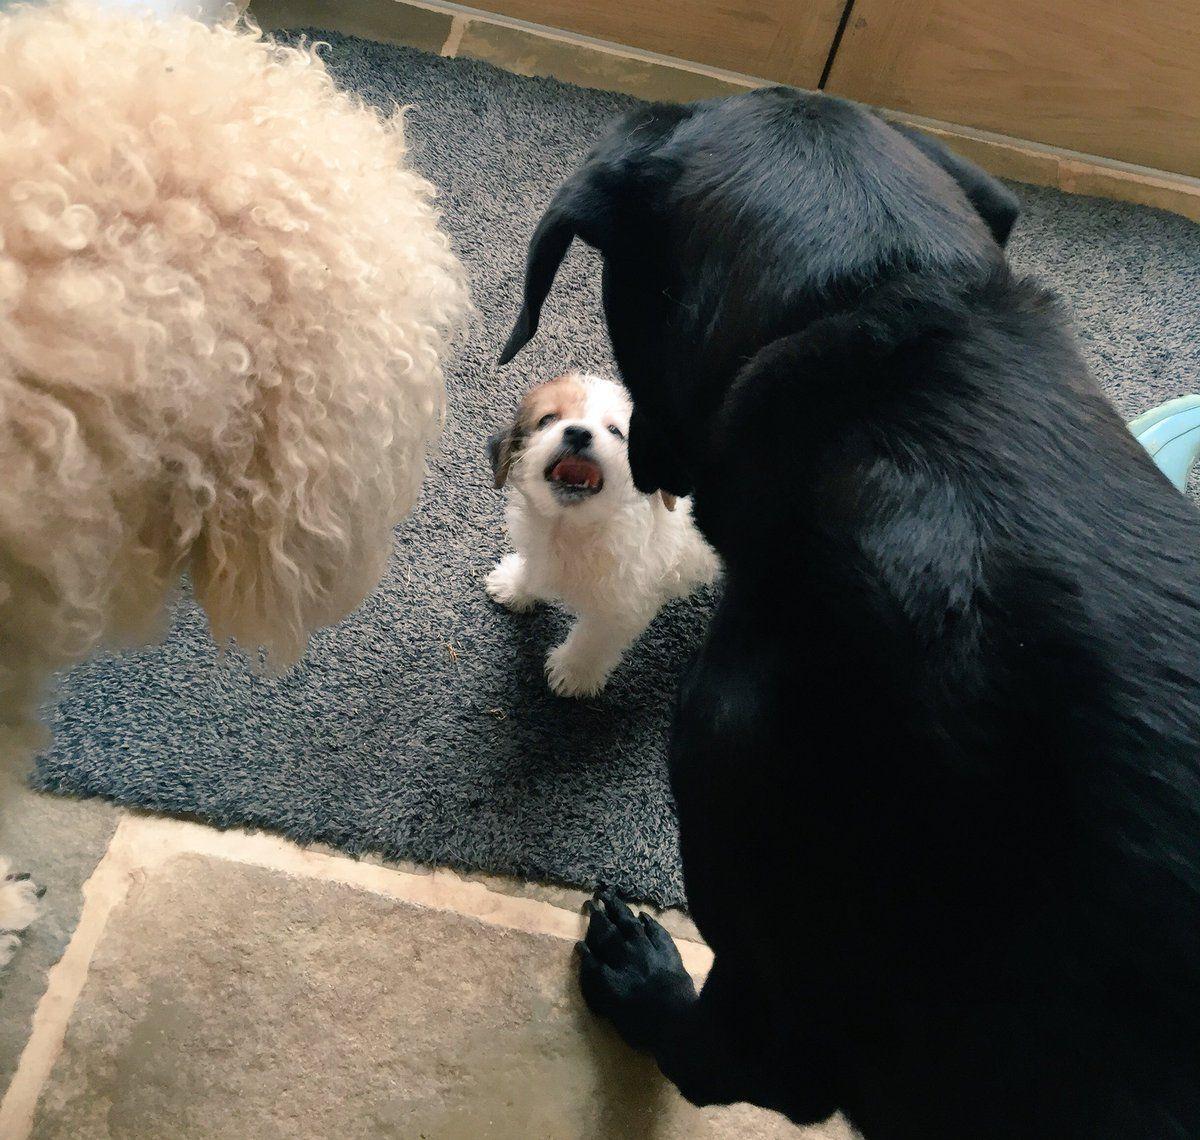 Yeah, I'm small. So? #MONDAYMotivation #Dogs #Fun #PAWS #CuteAlert #Leadership #BIZBoost